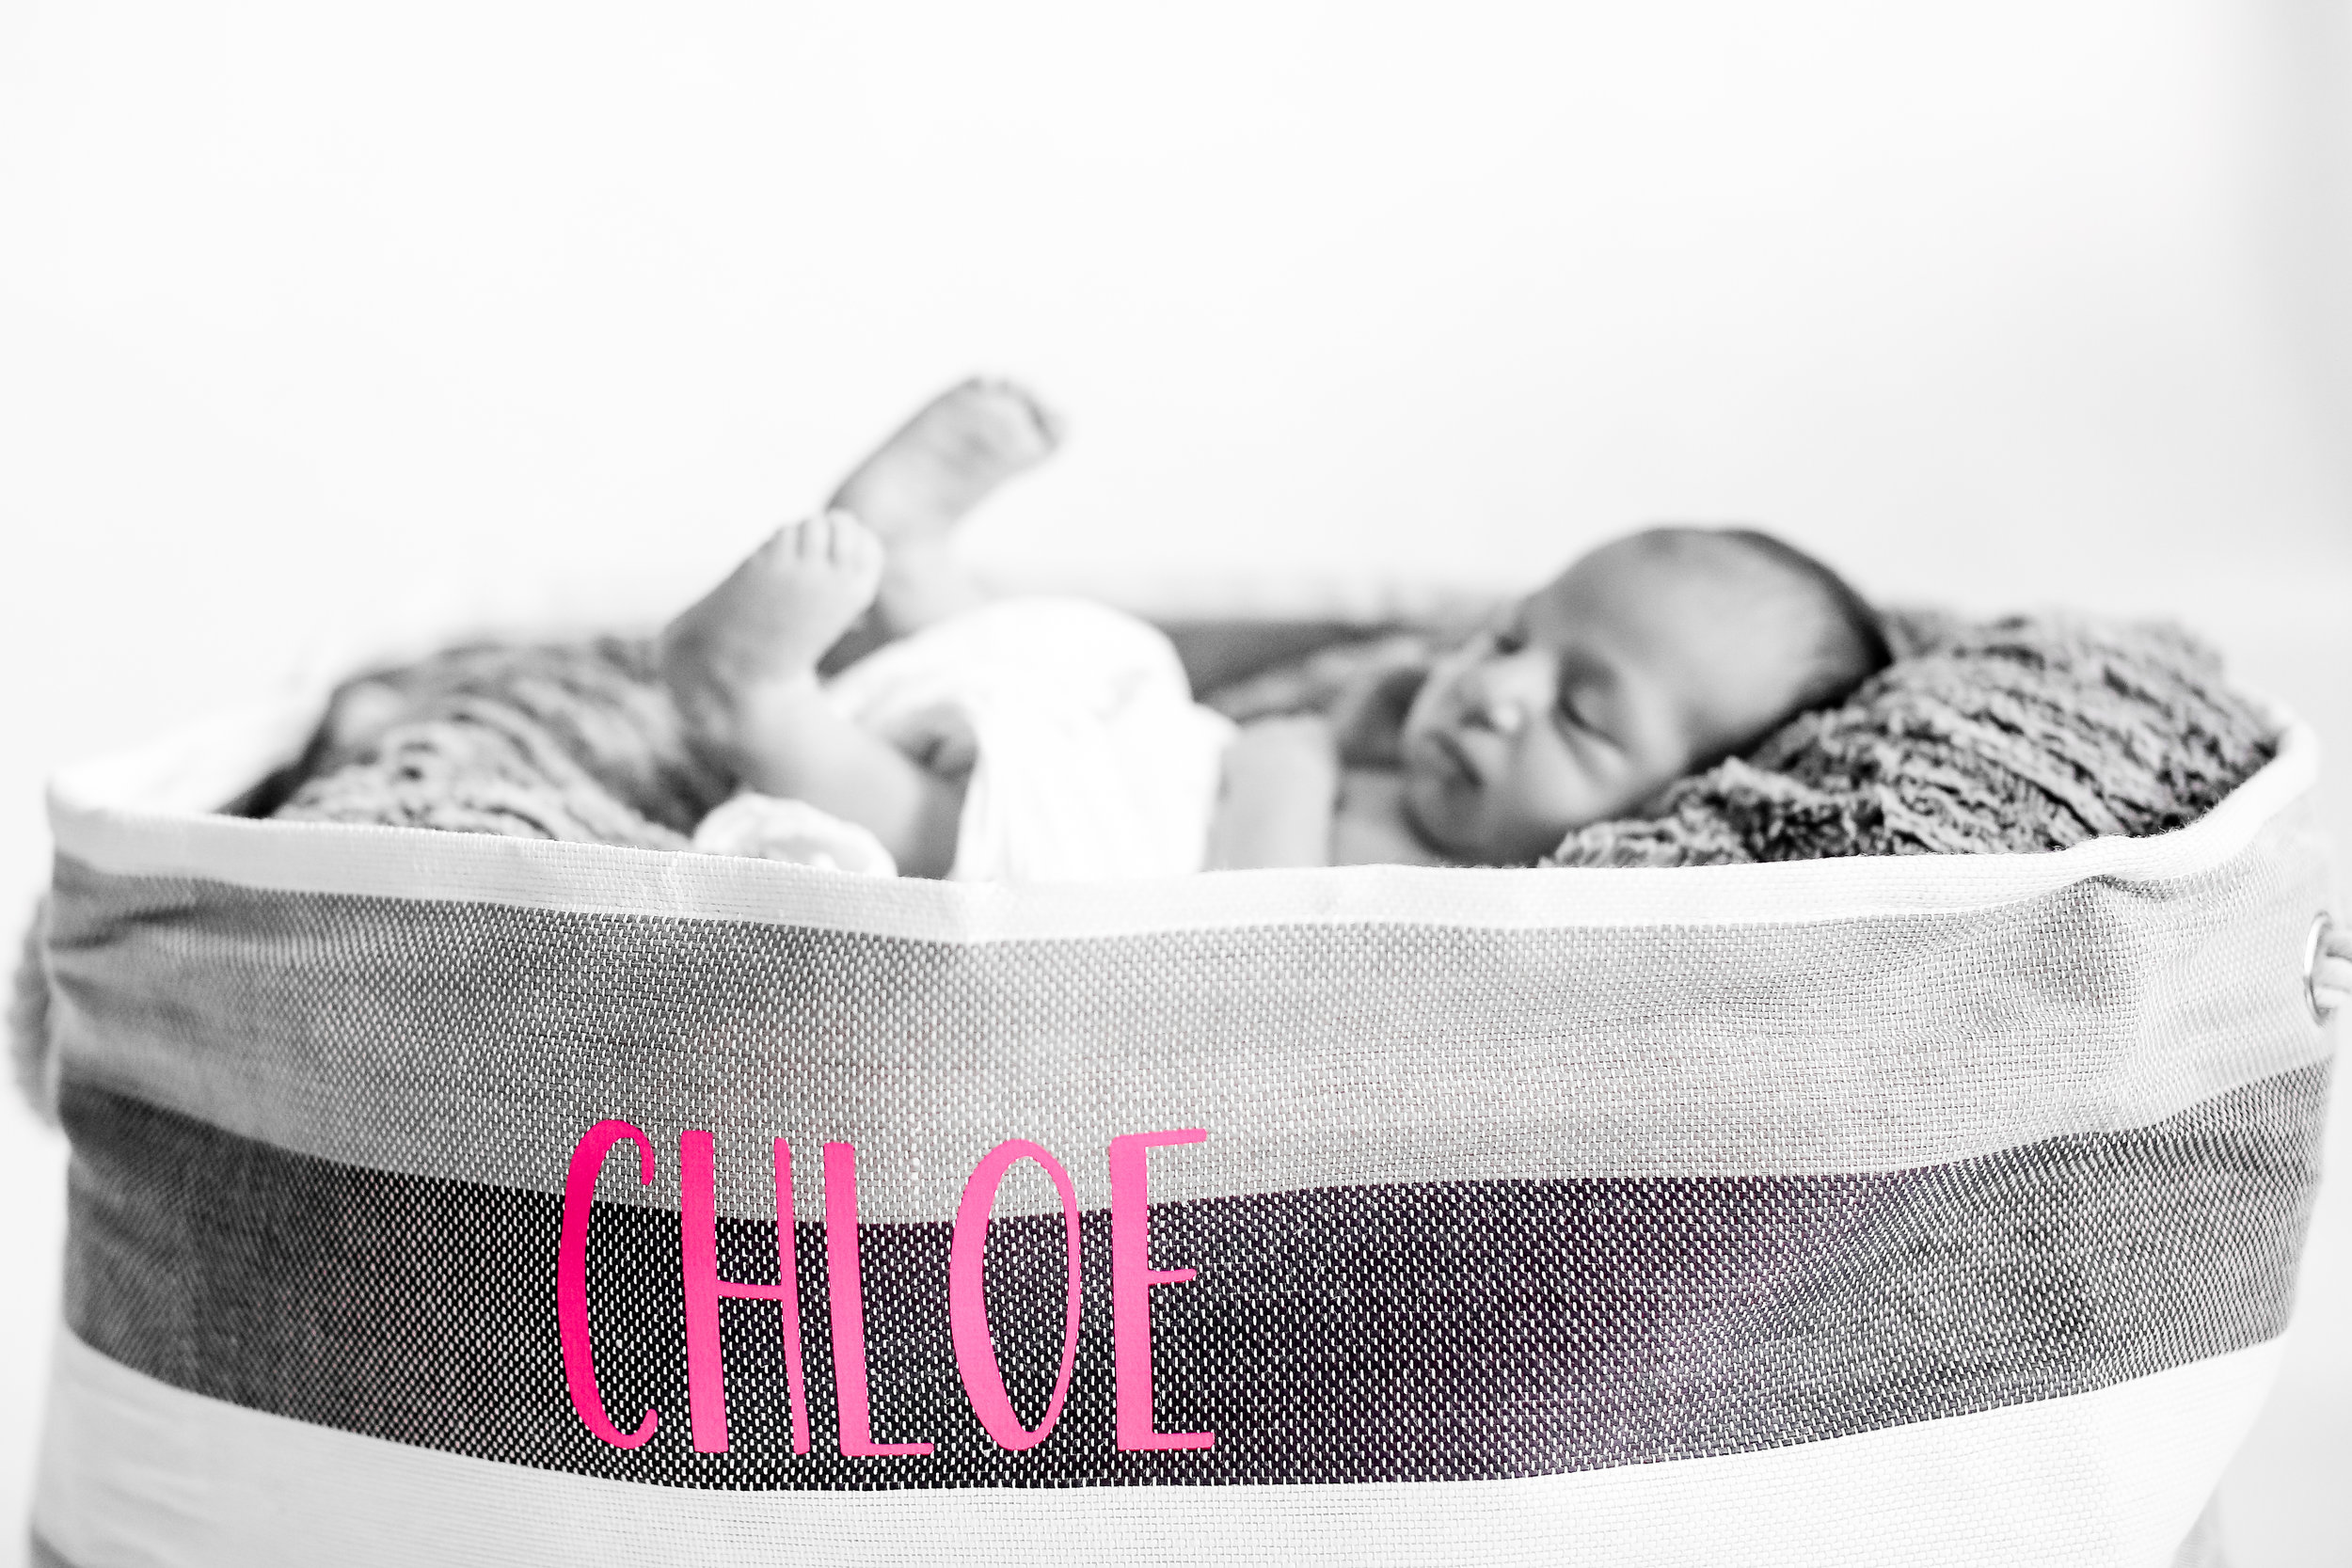 1069-160A9231-Chiko Photography.jpg